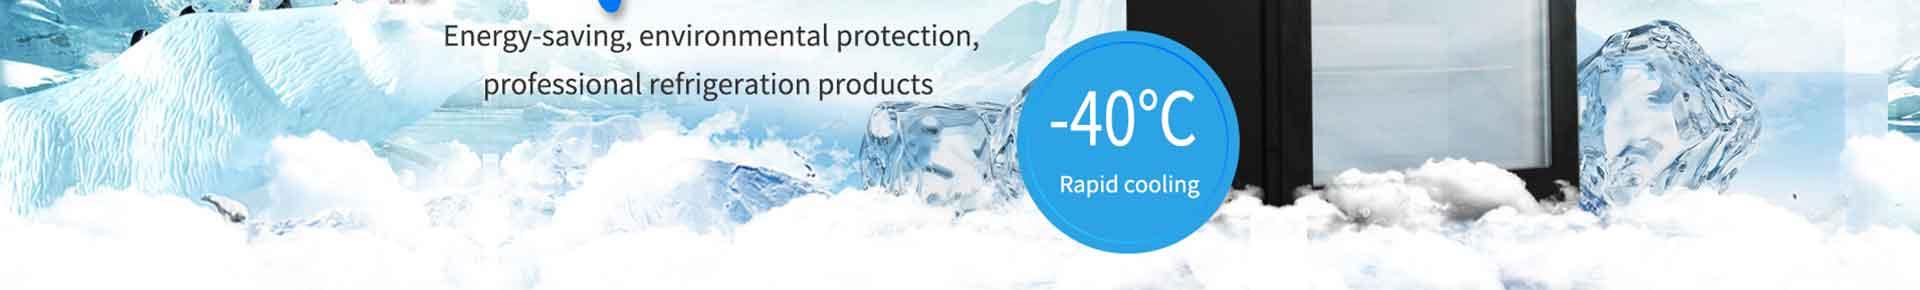 Refrigerated display cabinet manufacturer